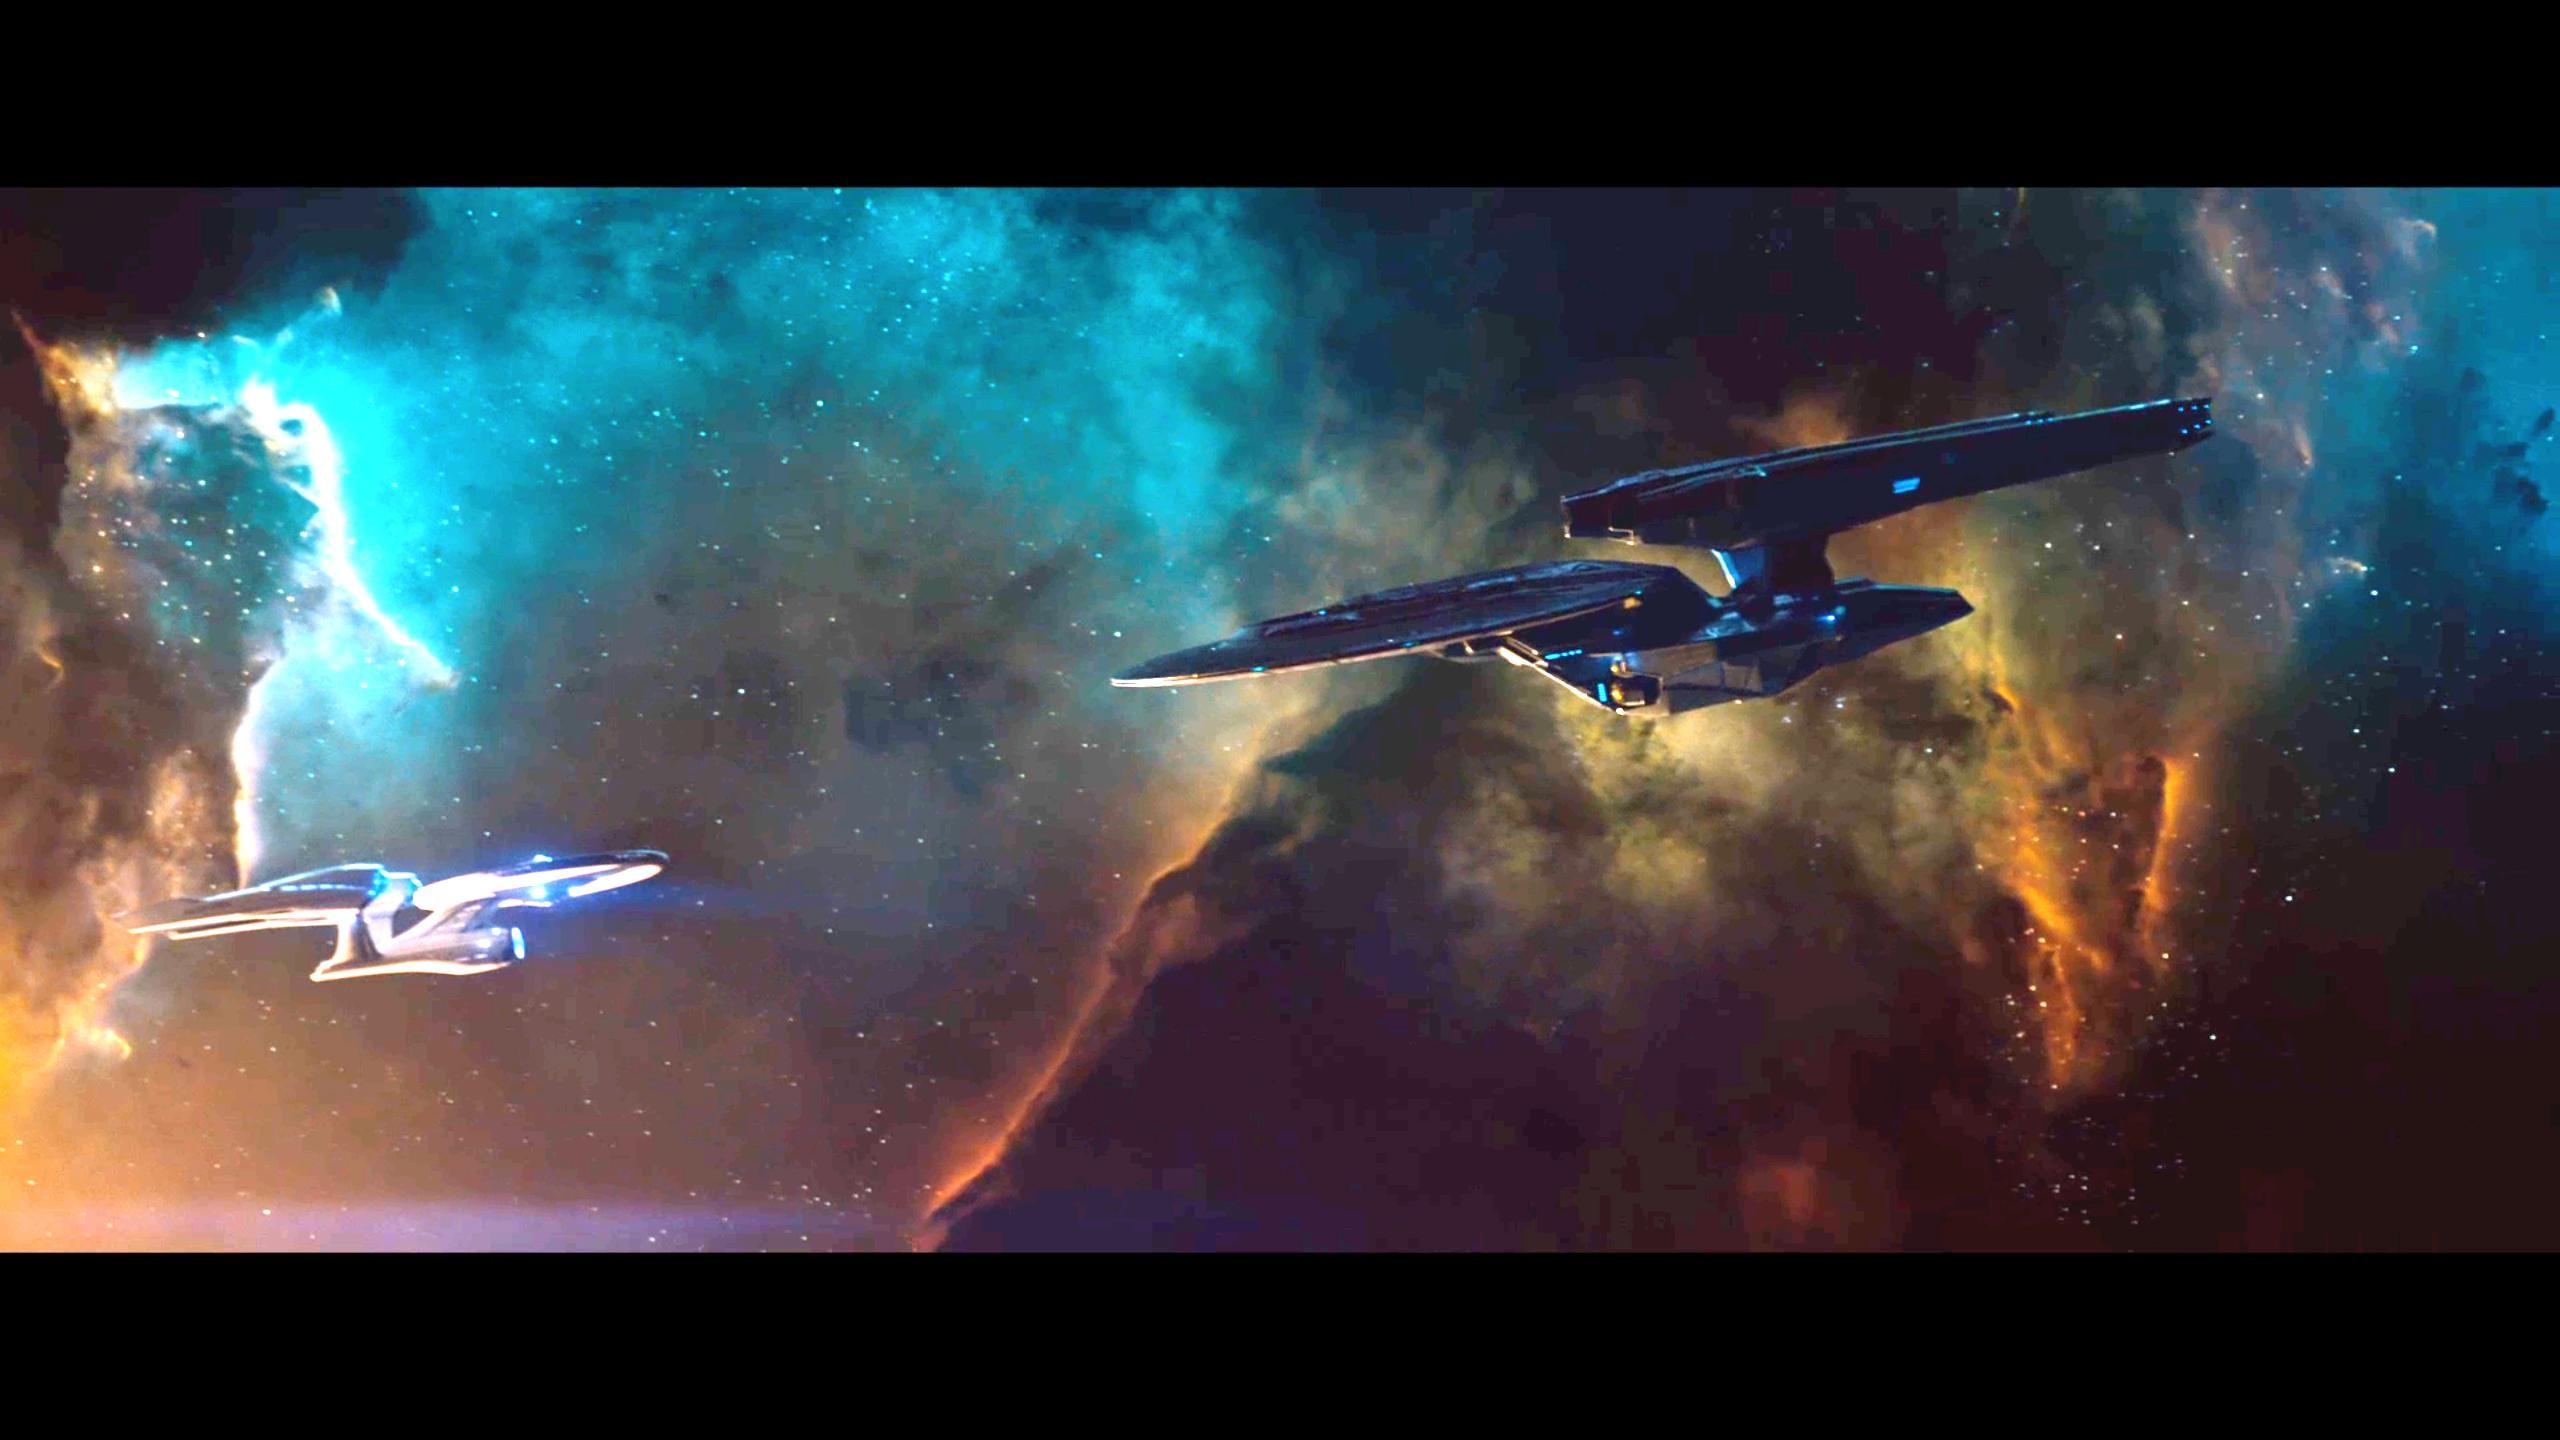 Star Trek Wallpaper 1080p 72 Images